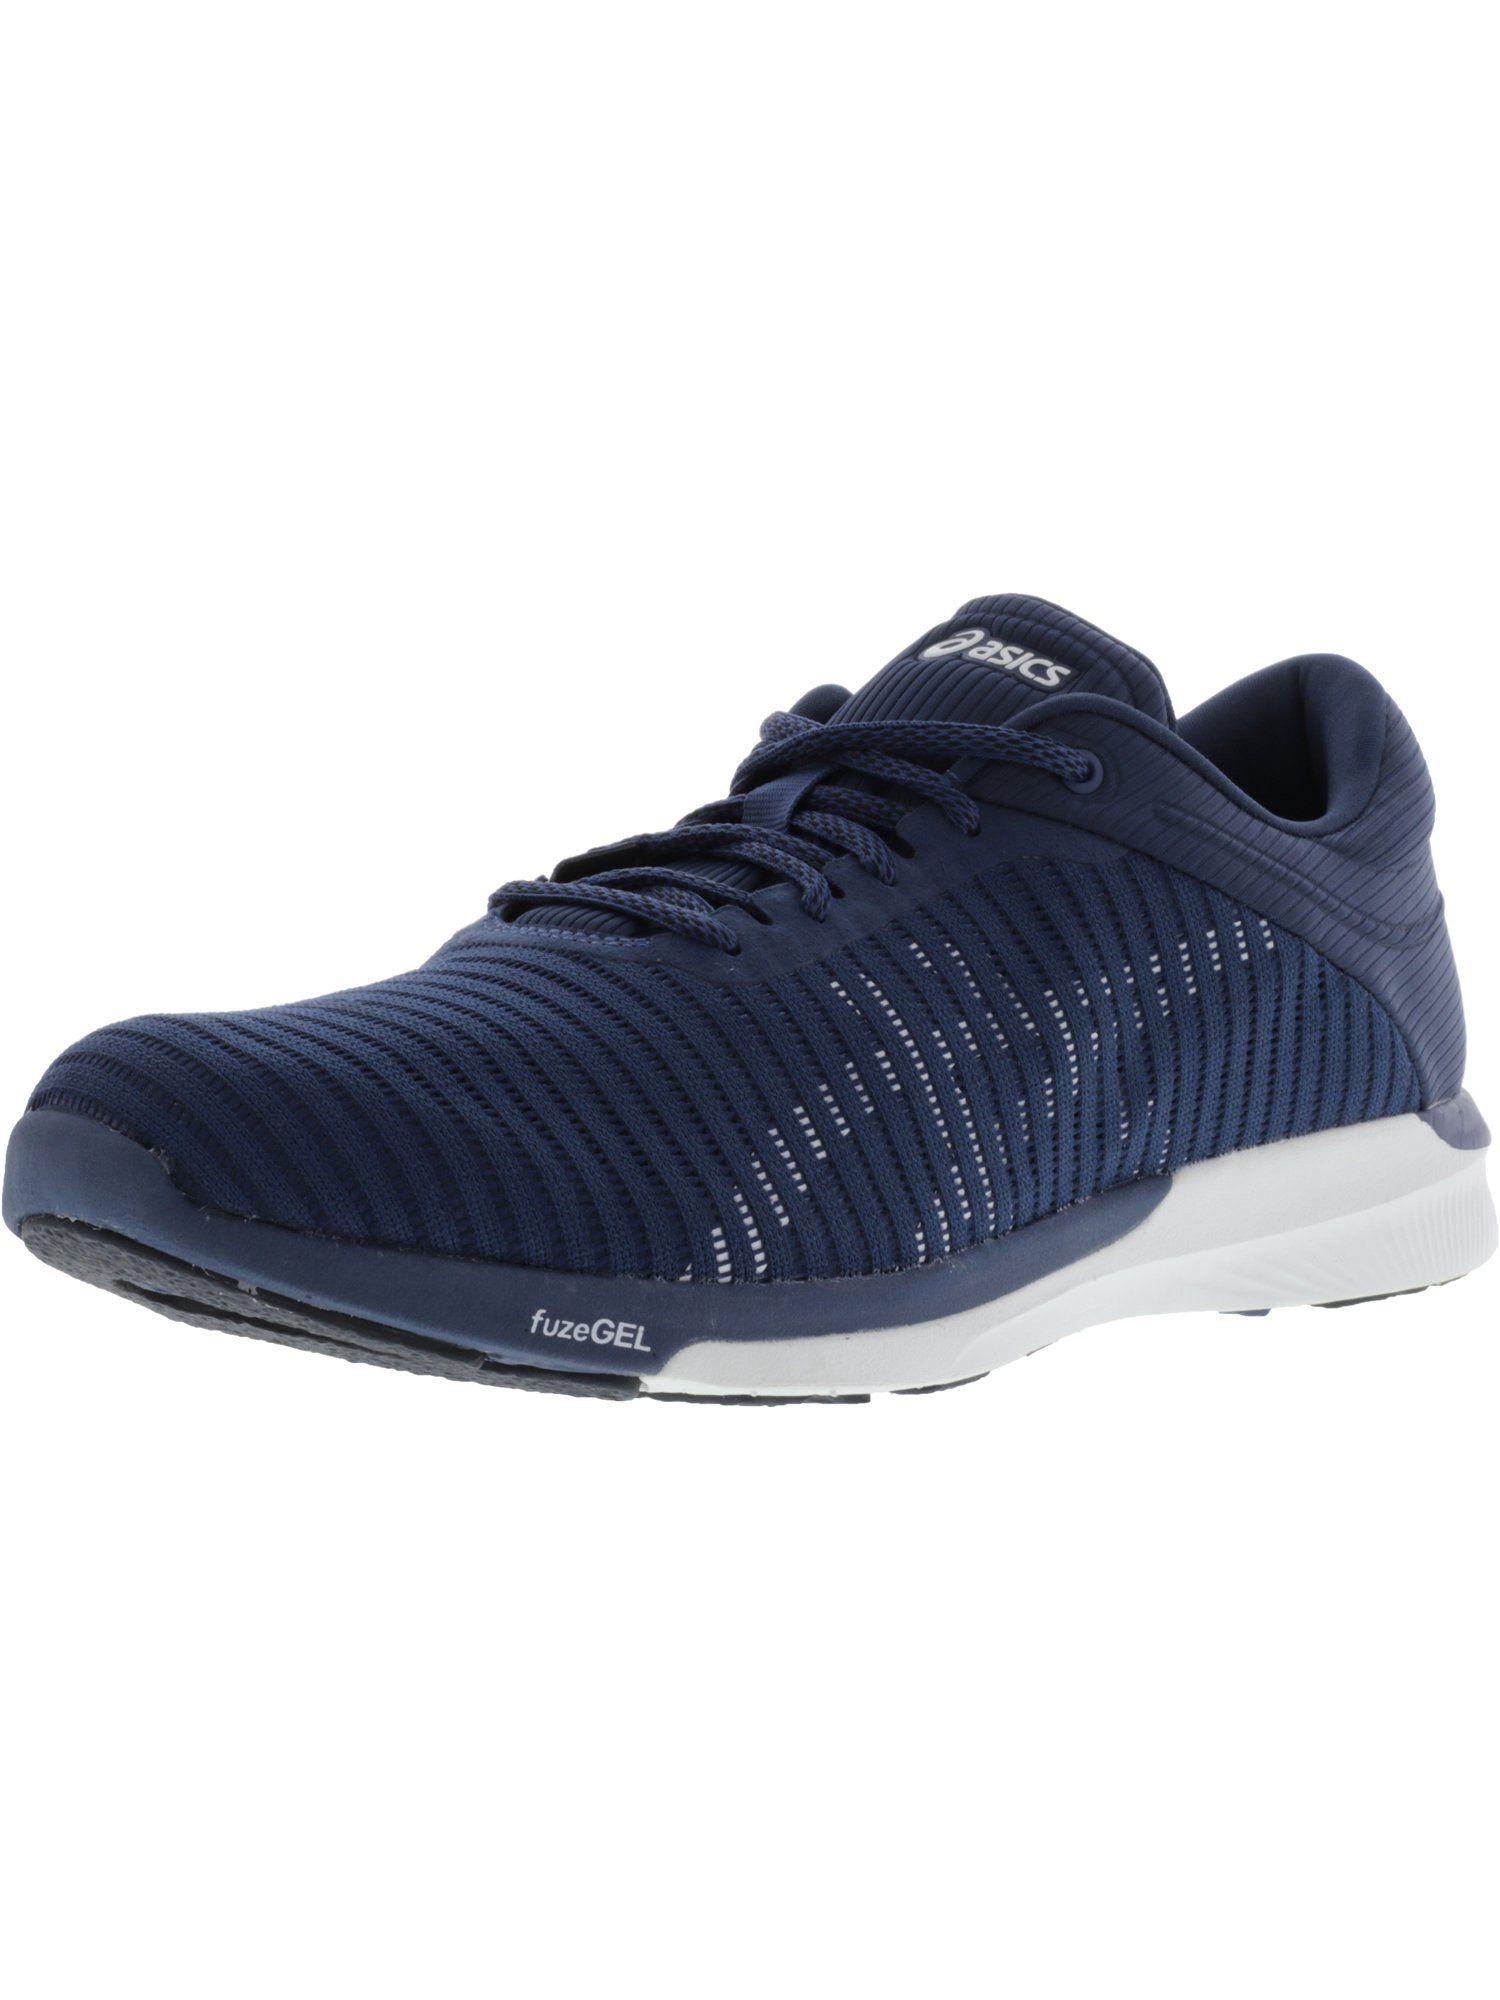 chaussure de running fuzex asics